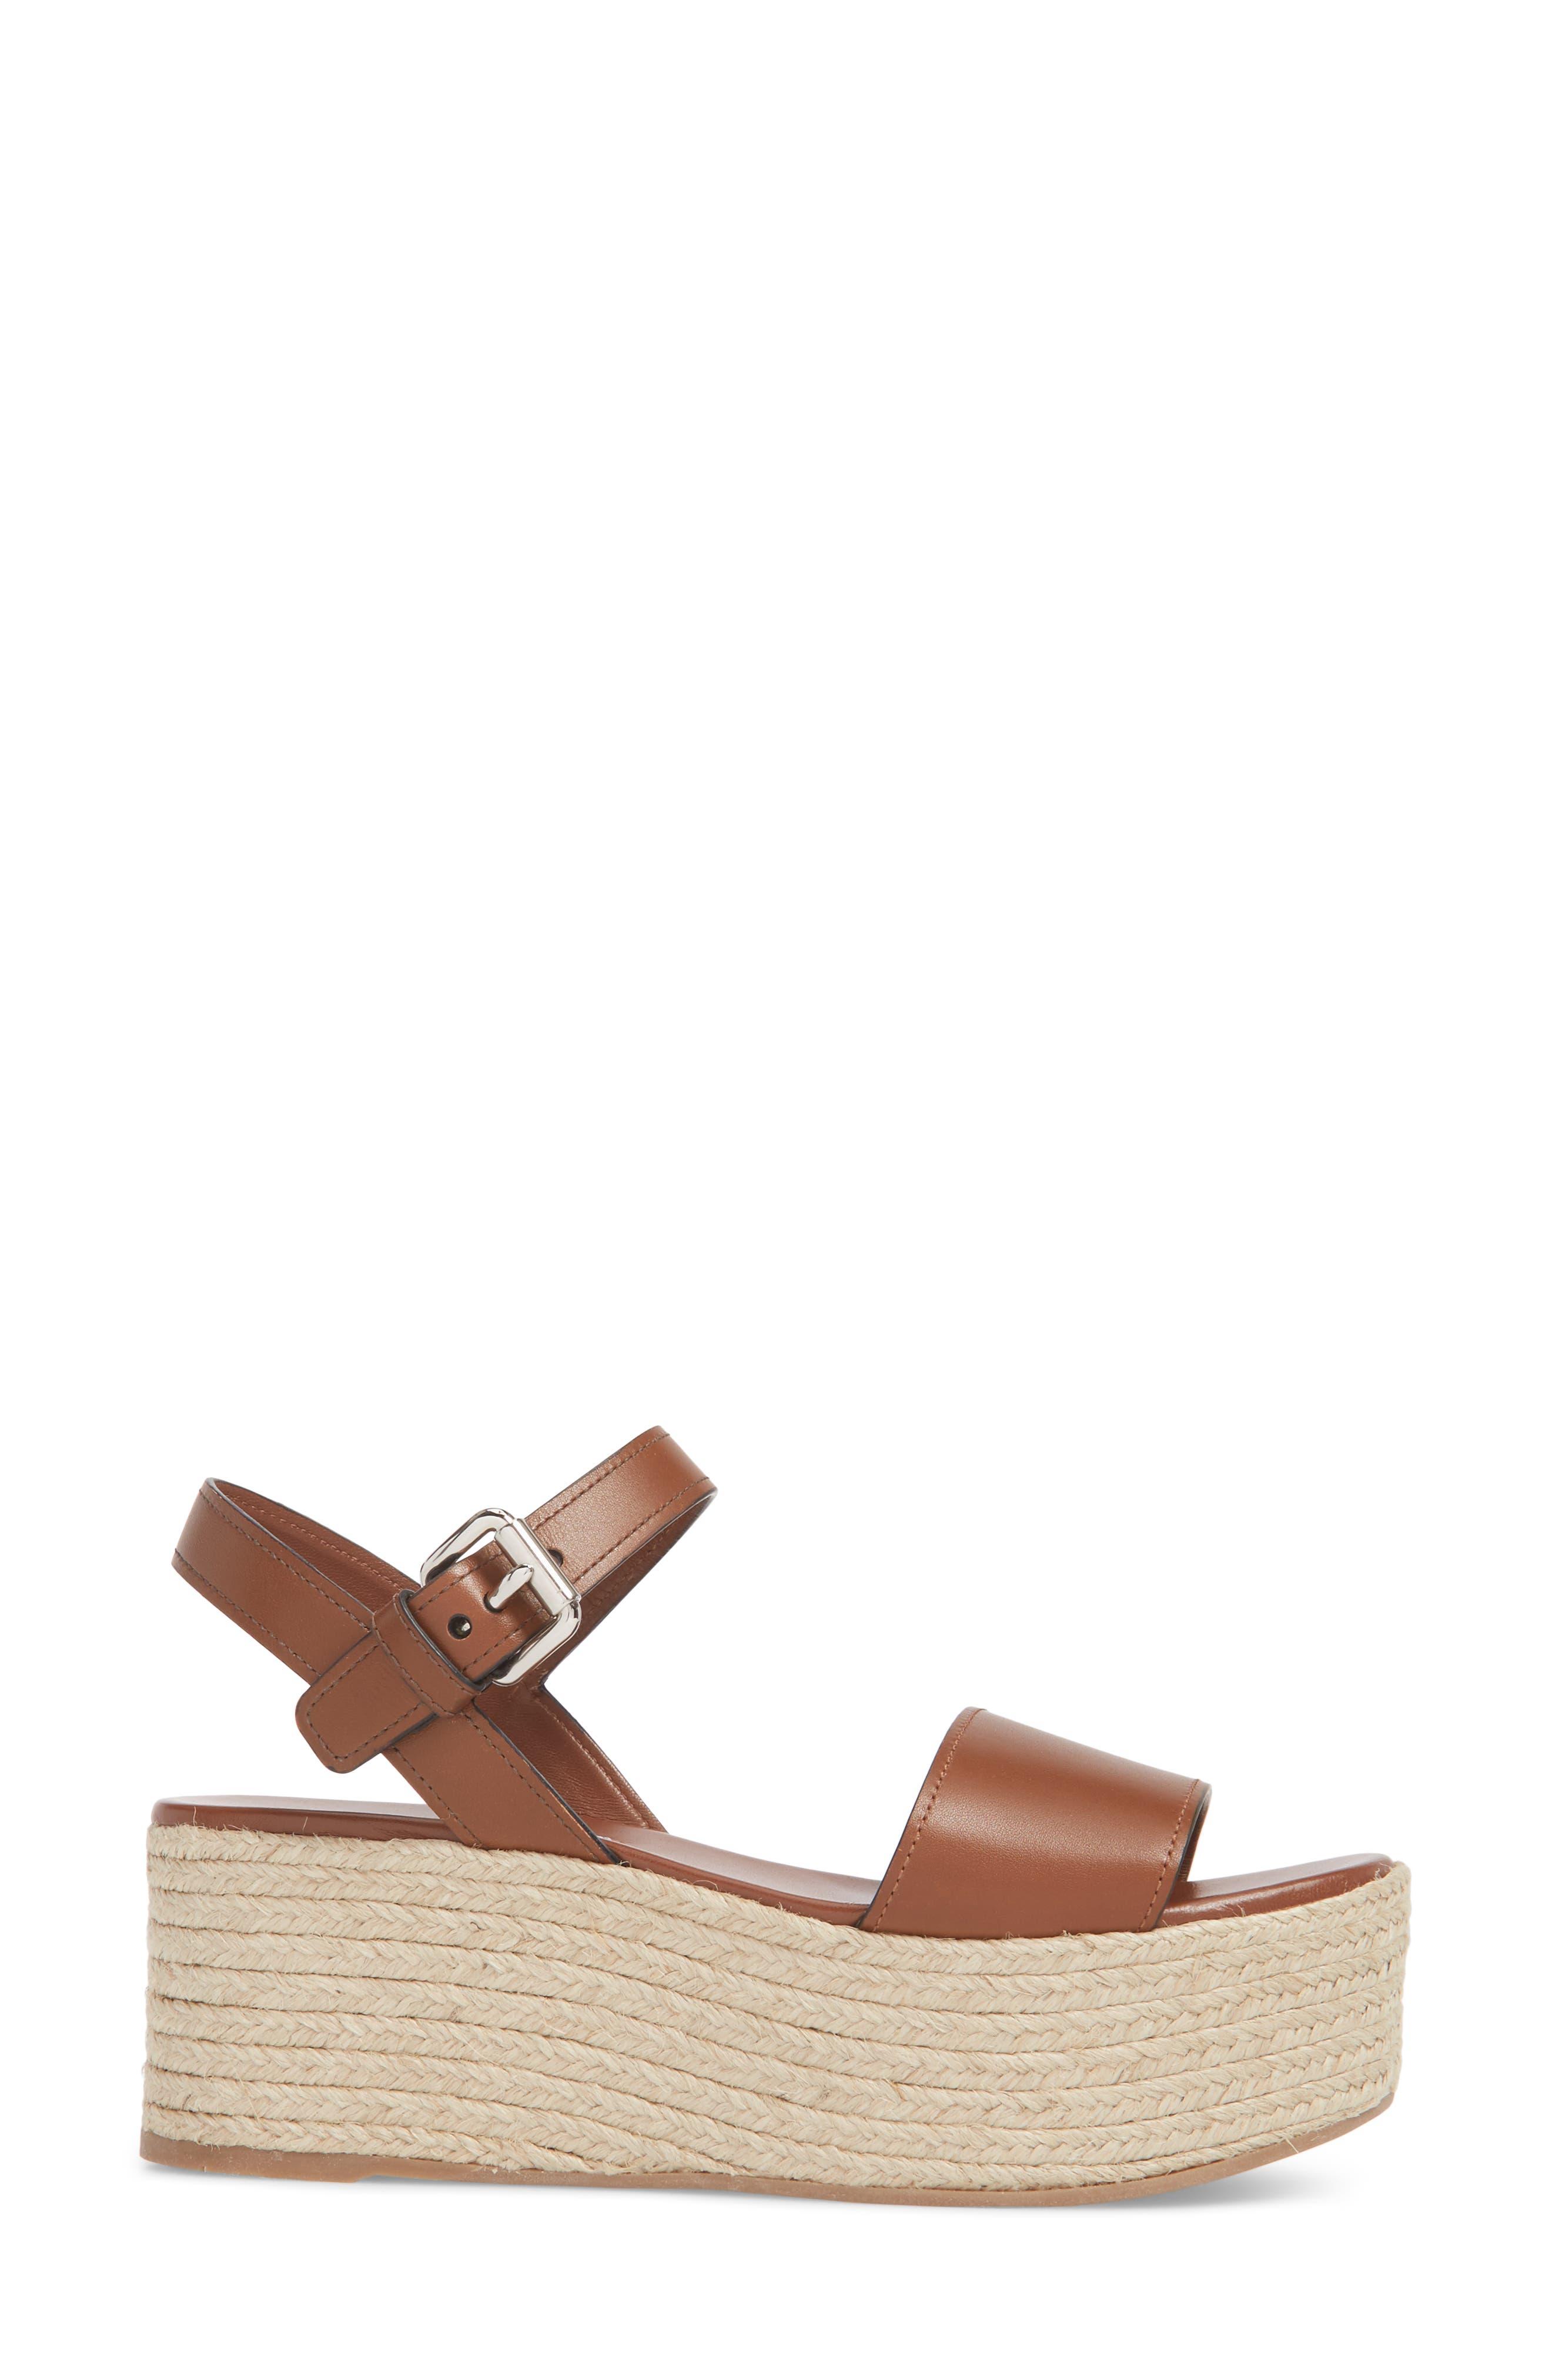 Alternate Image 3  - Prada Platform Espadrille Sandal (Women)